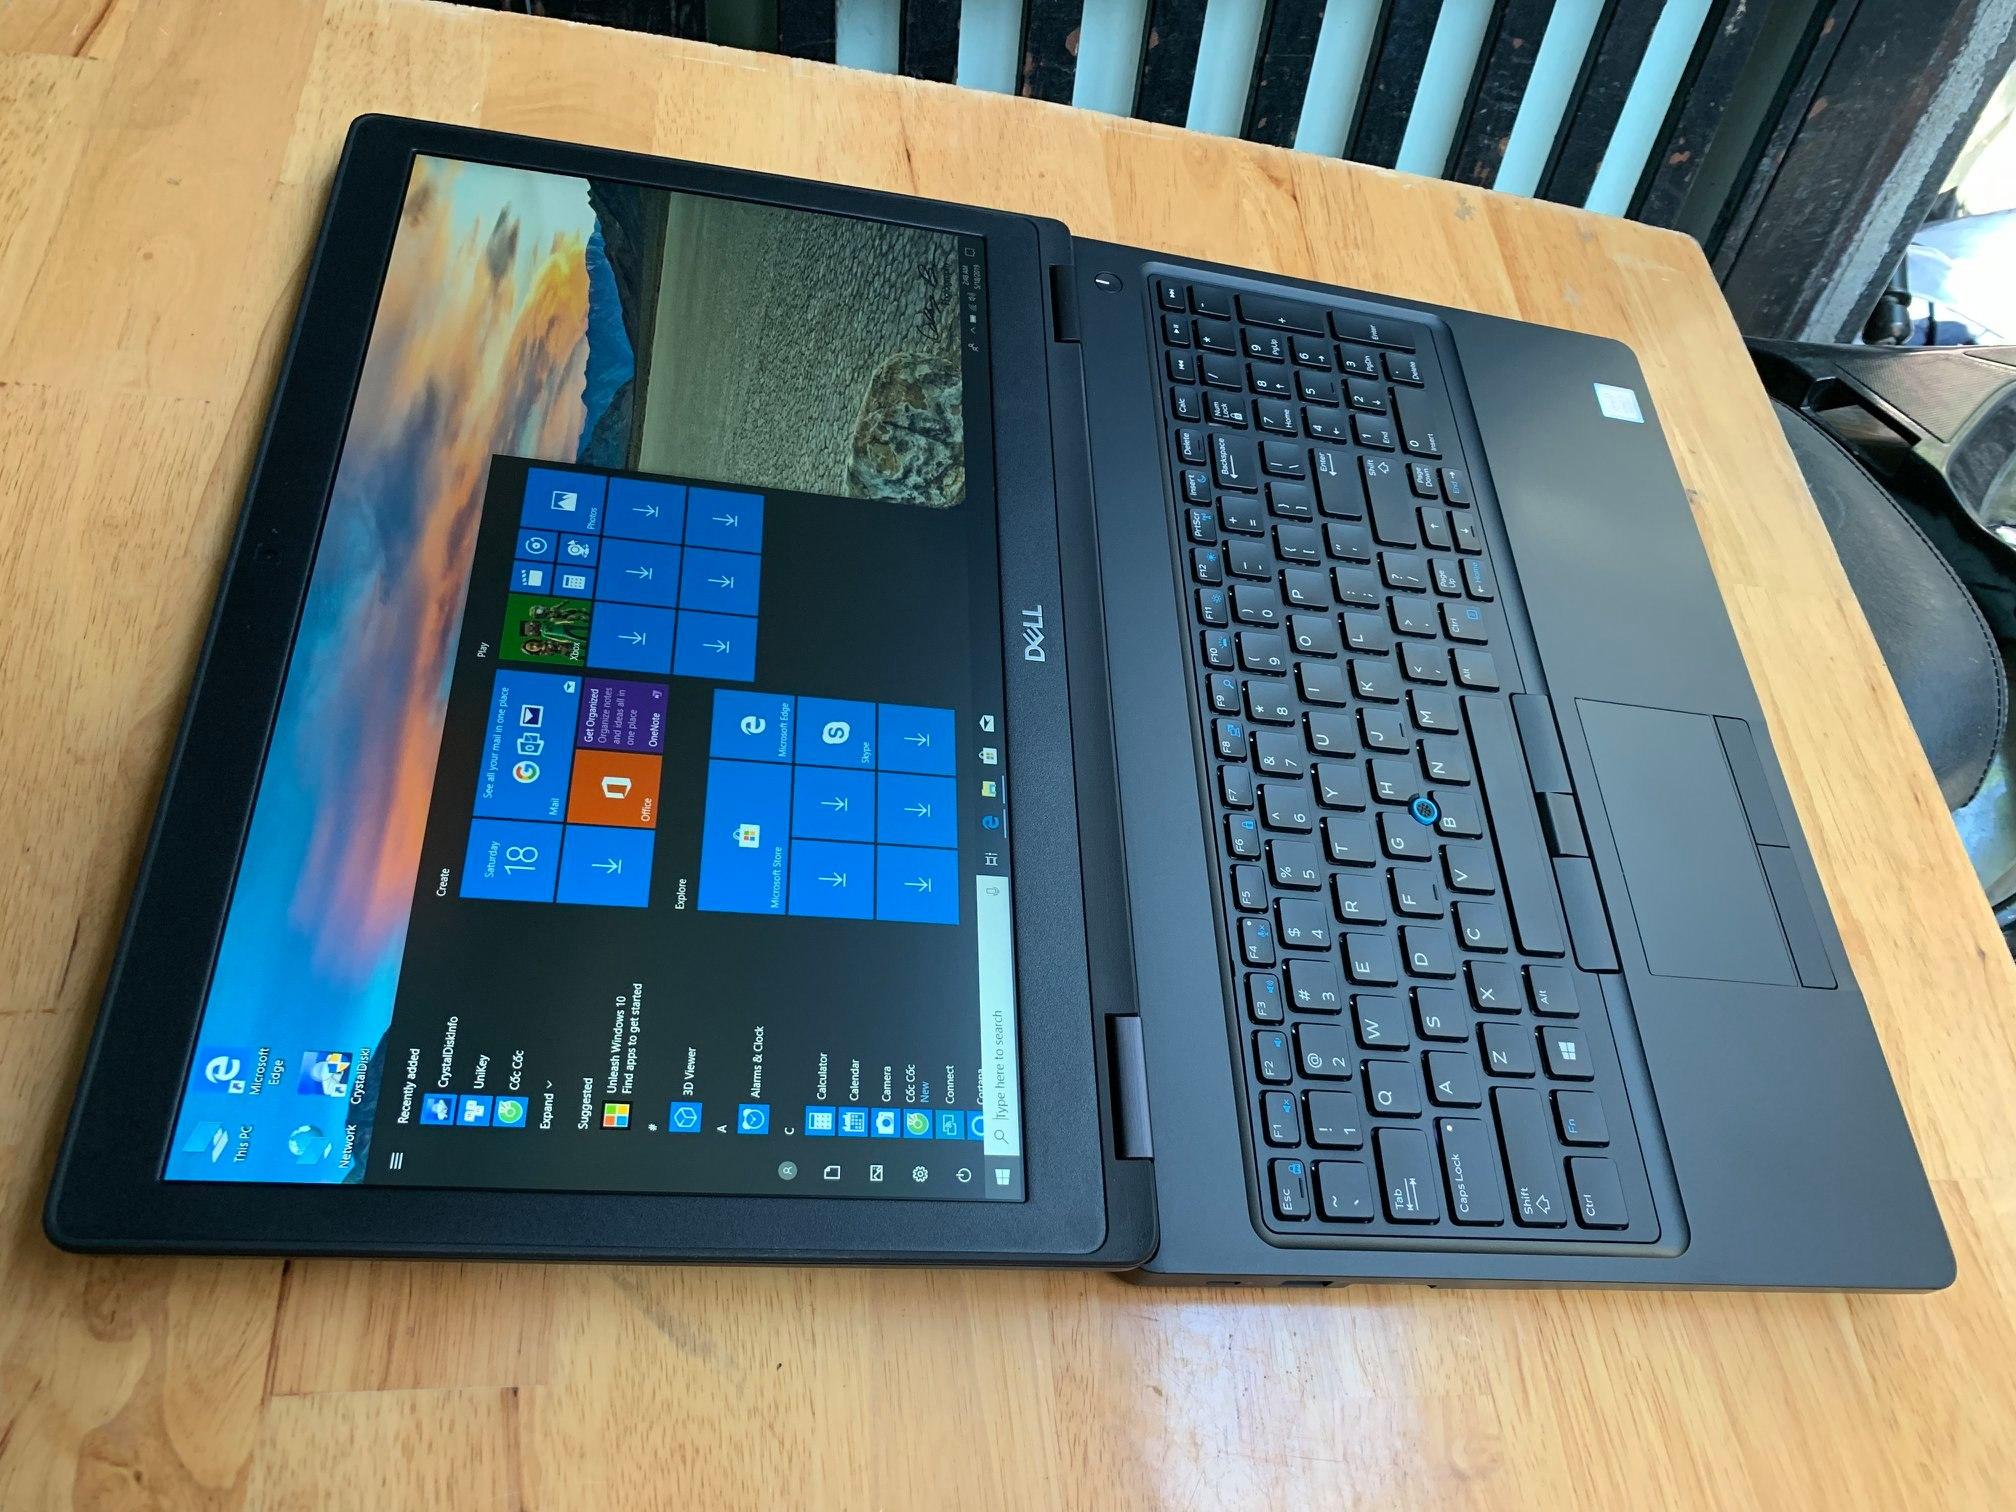 ==> bán 50 cái laptop Dell ... Core i3, i5, i7 ...máy đẹp, zin all. - 45